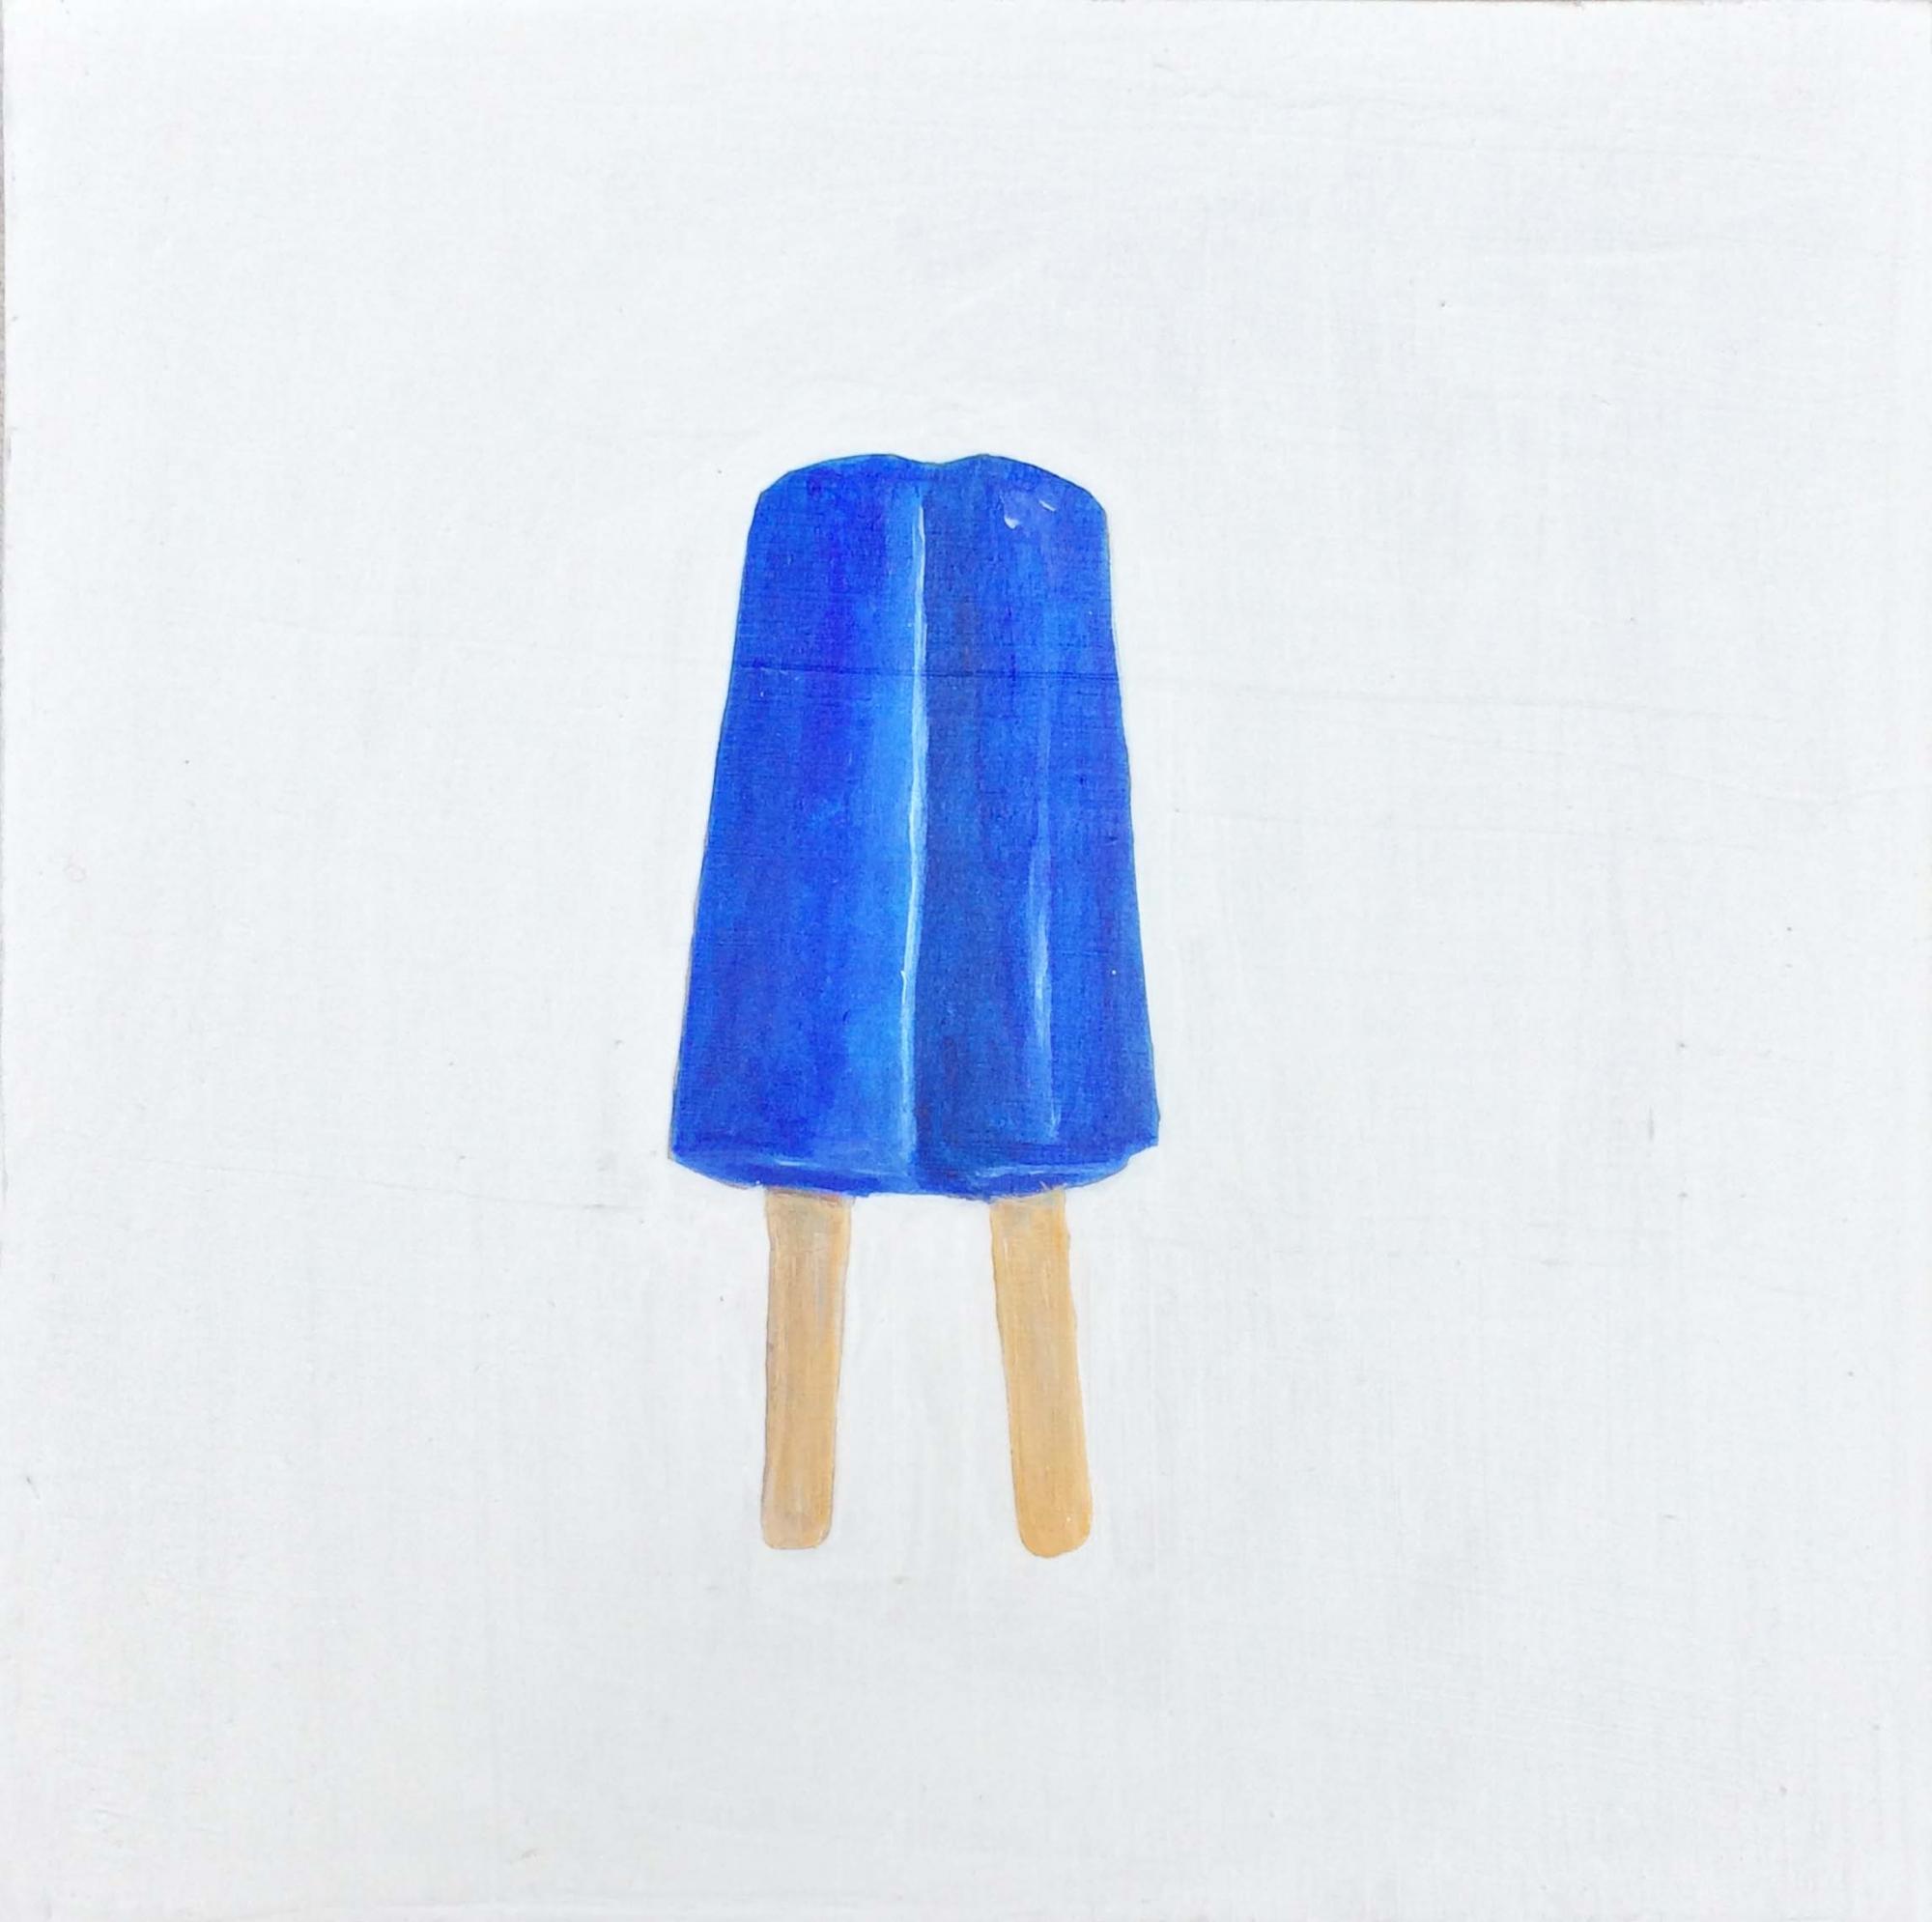 Blue Ice Pop by EM V